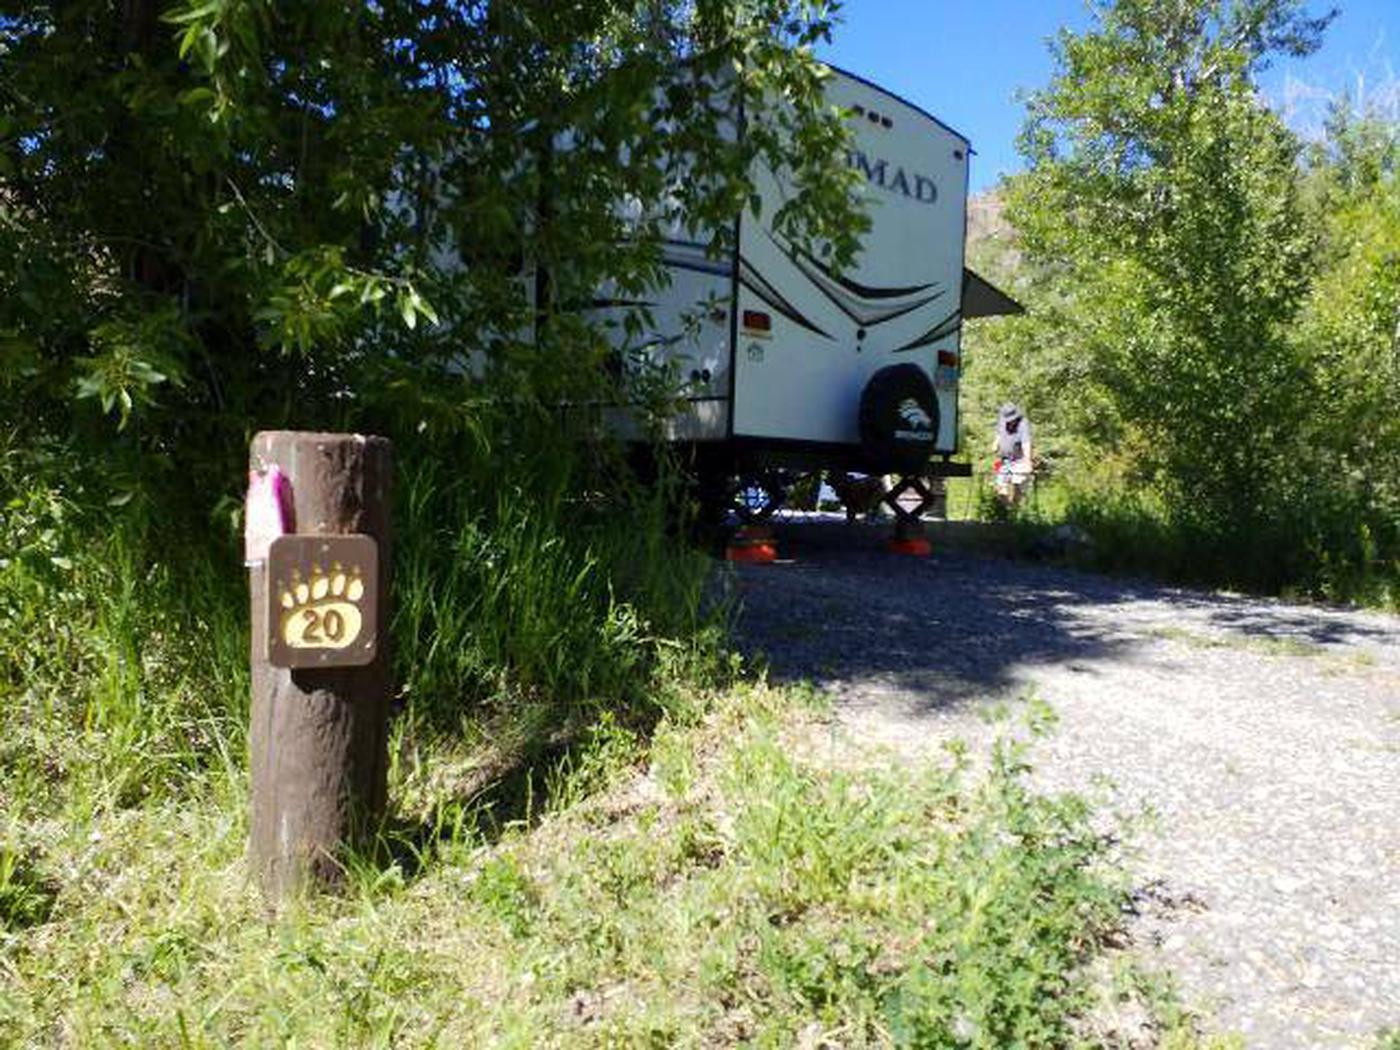 Wapiti Campsite 20 - Post